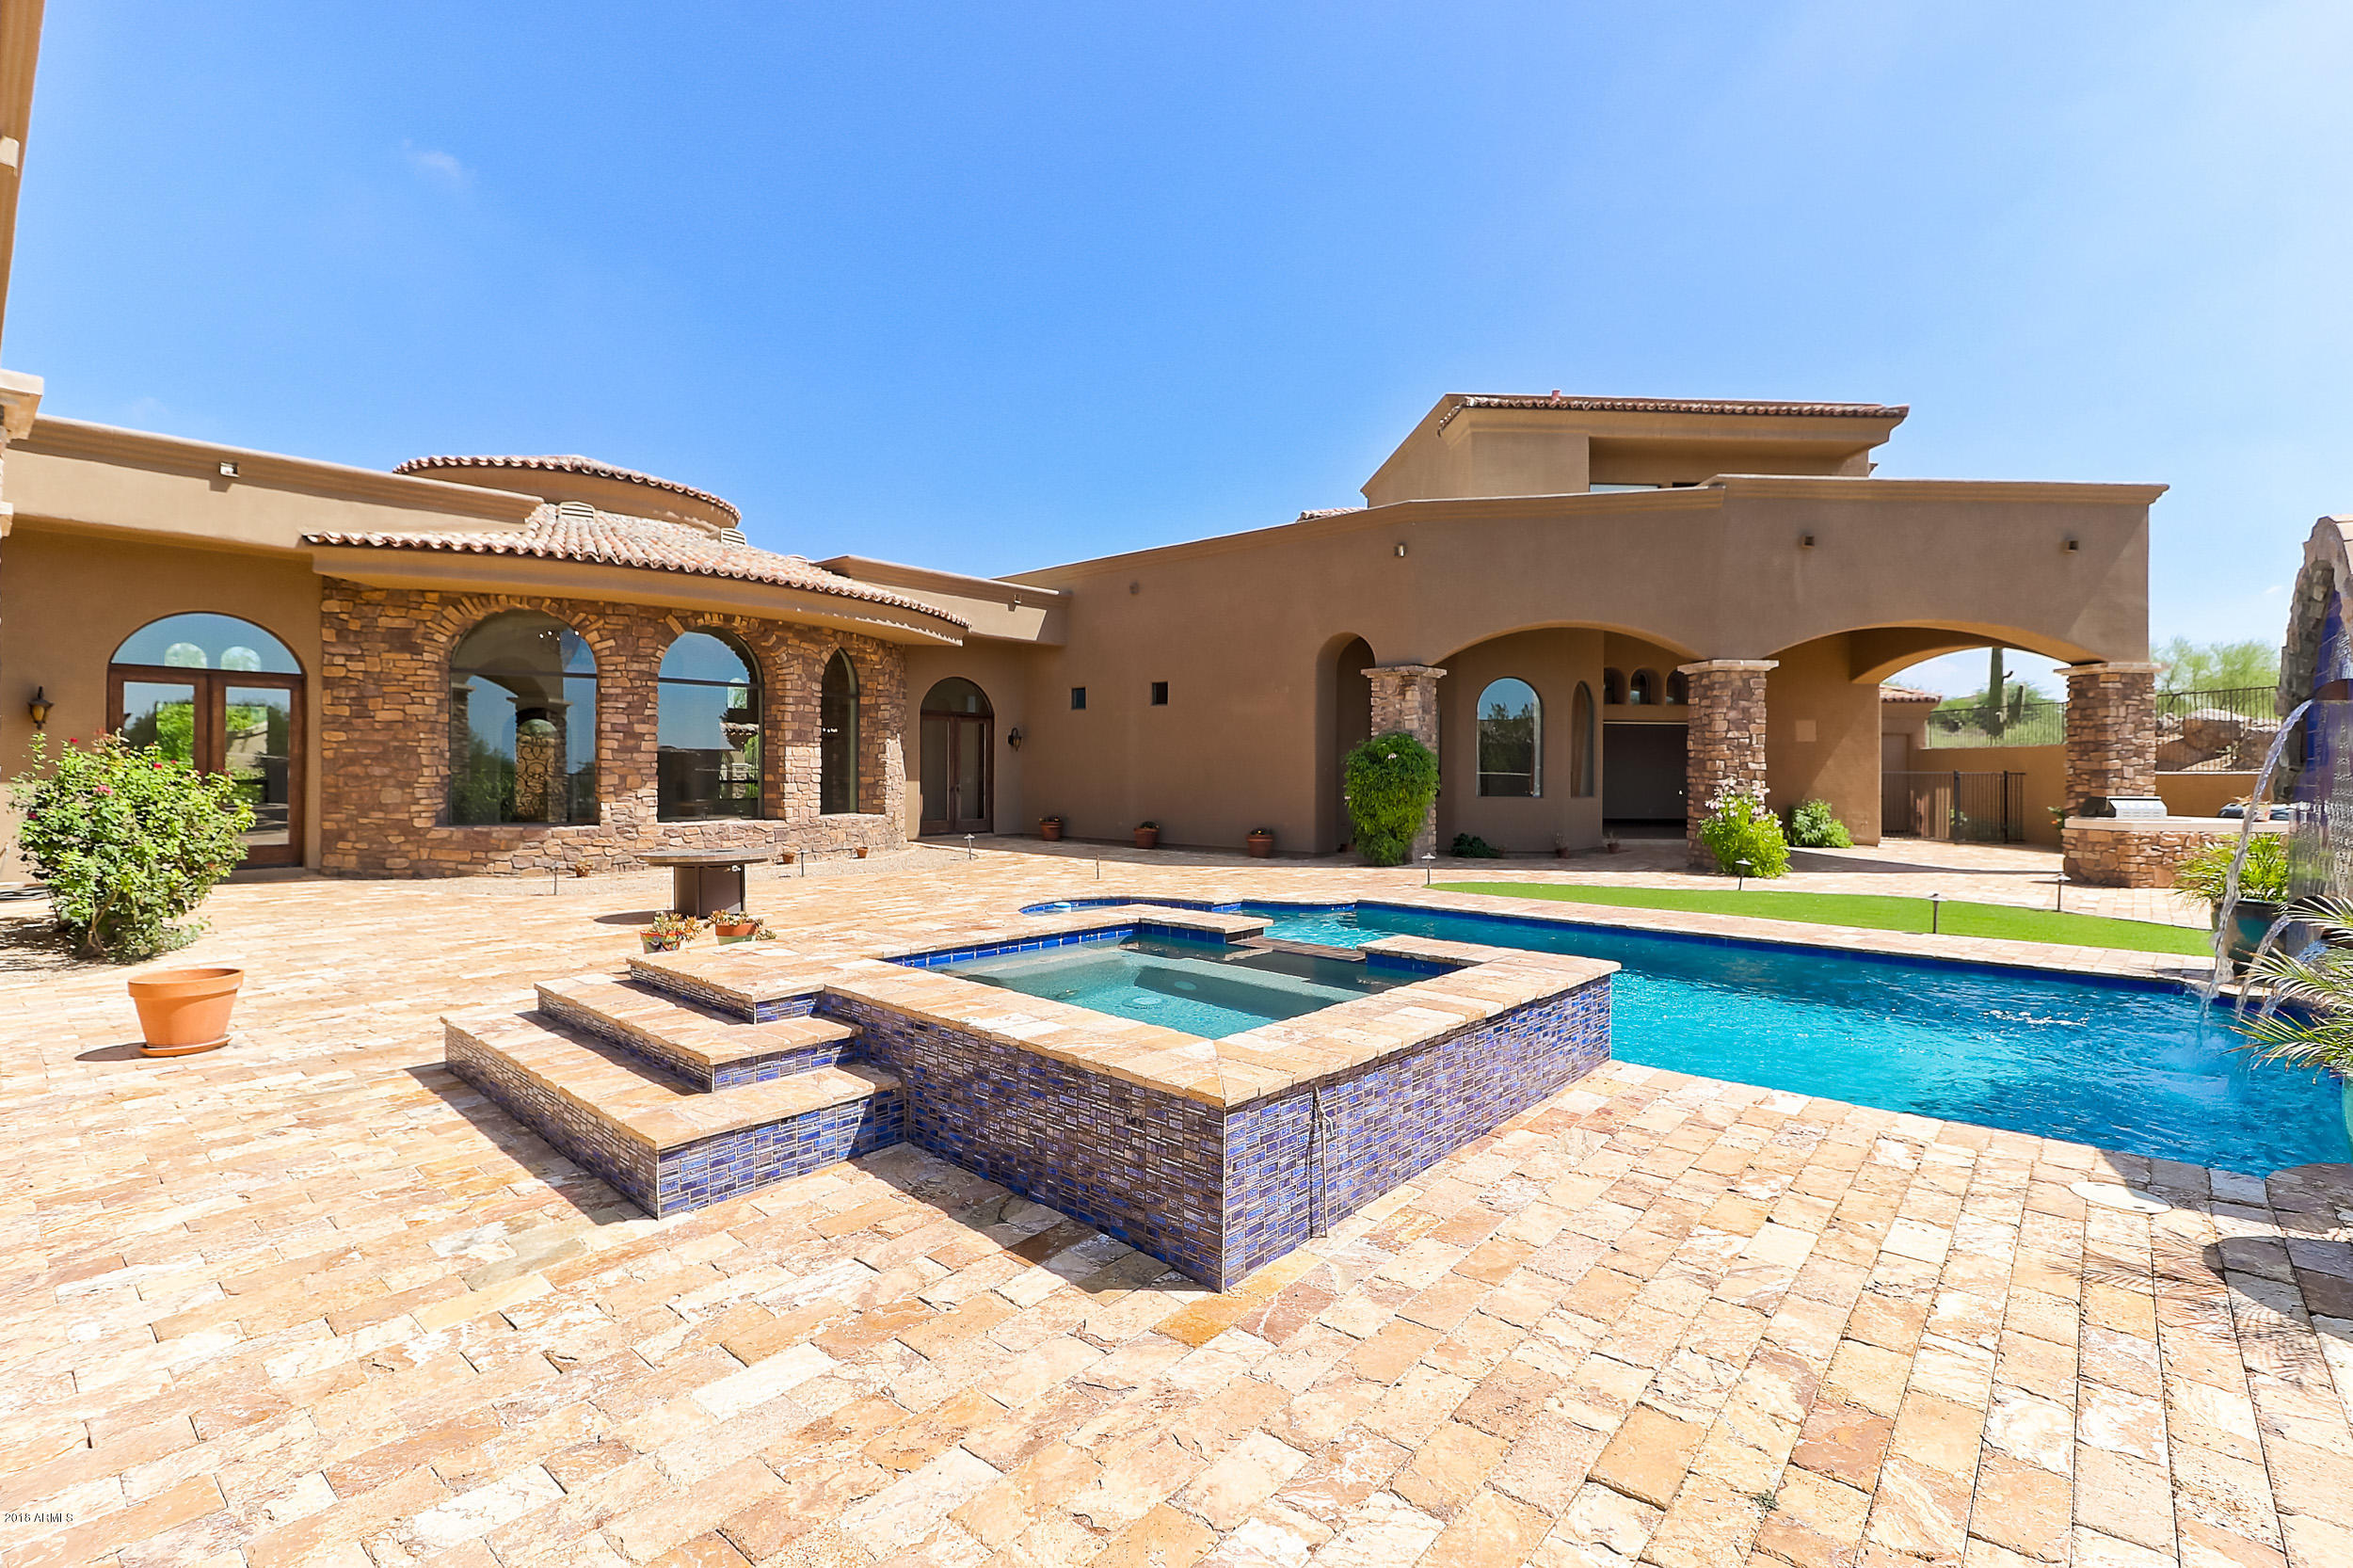 Photo of 10629 E Troon North Drive, Scottsdale, AZ 85262